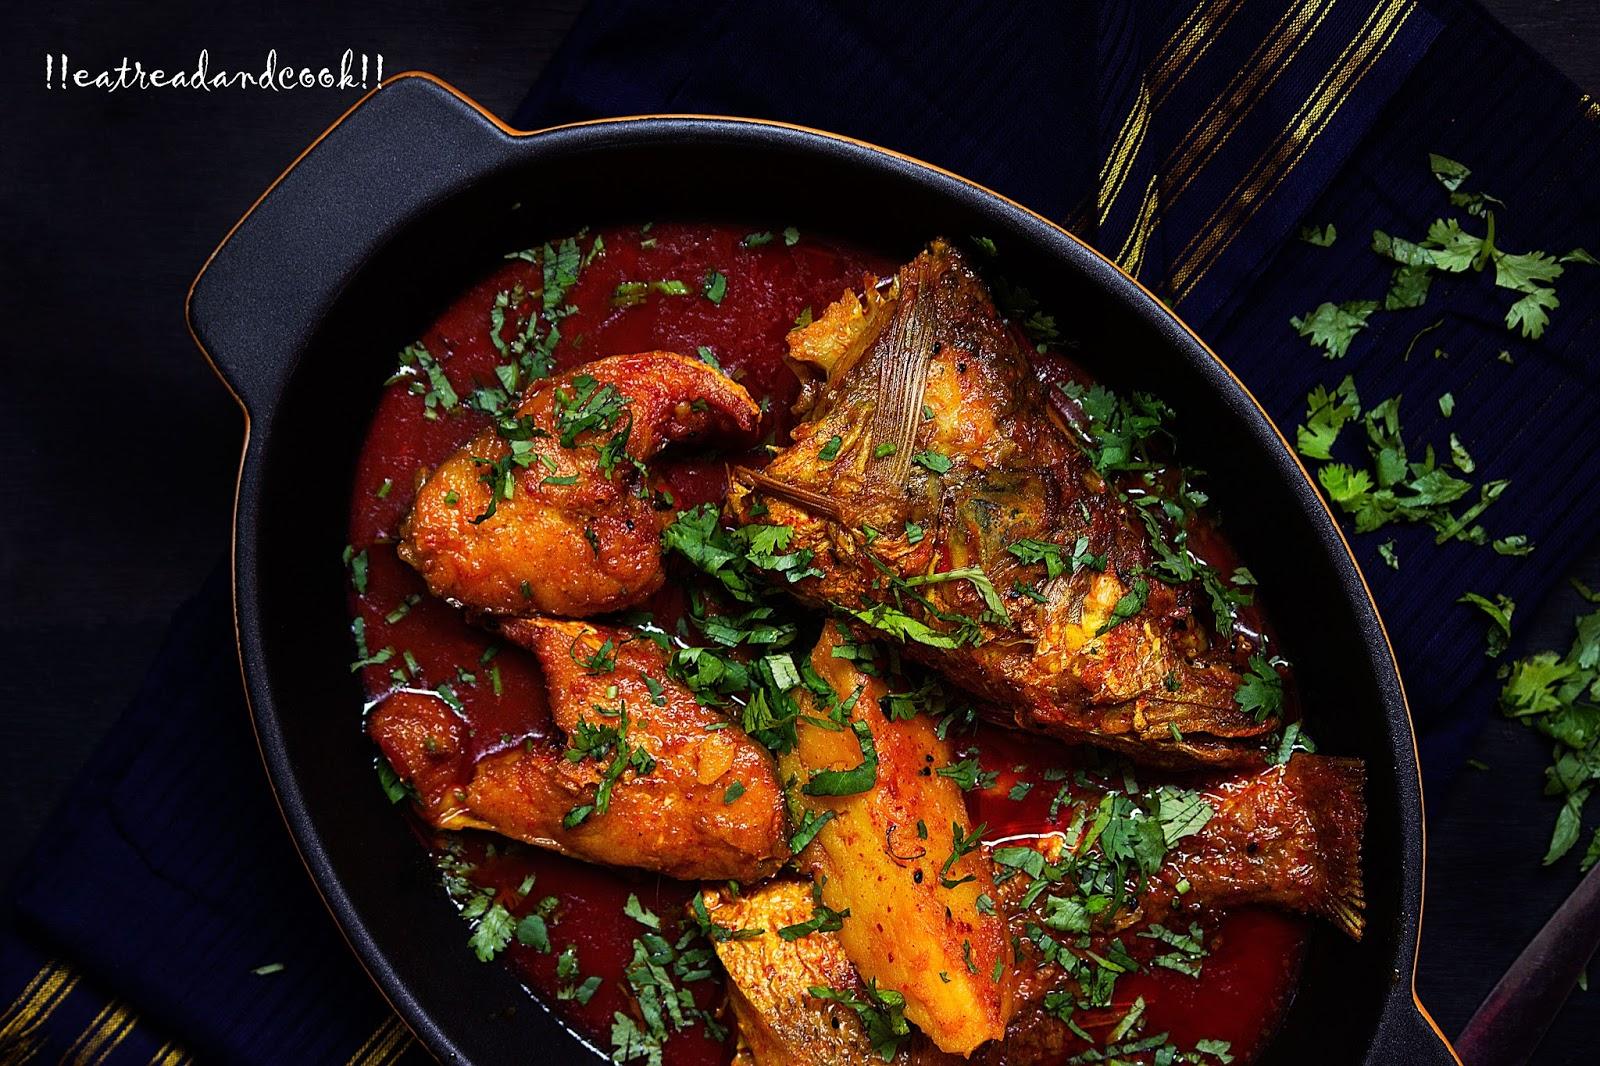 Kalo jeera die macher jhal bengali spicy fish curry with nigella bengali fish curry preparation bengali spicy macher jhal recipe ccuart Image collections